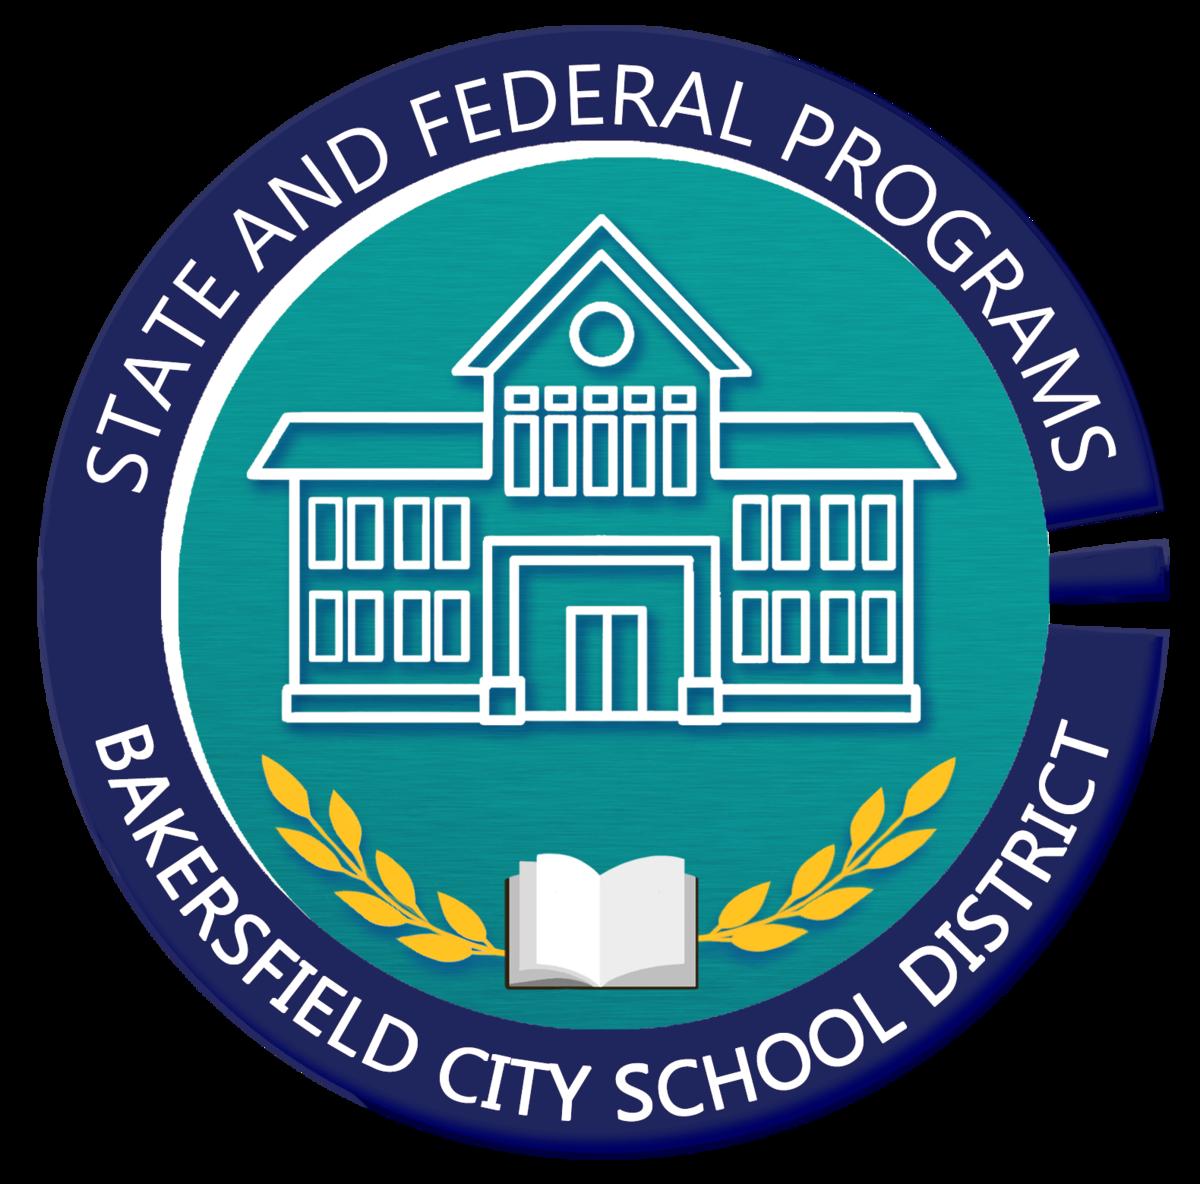 State & Federal Programs Logo